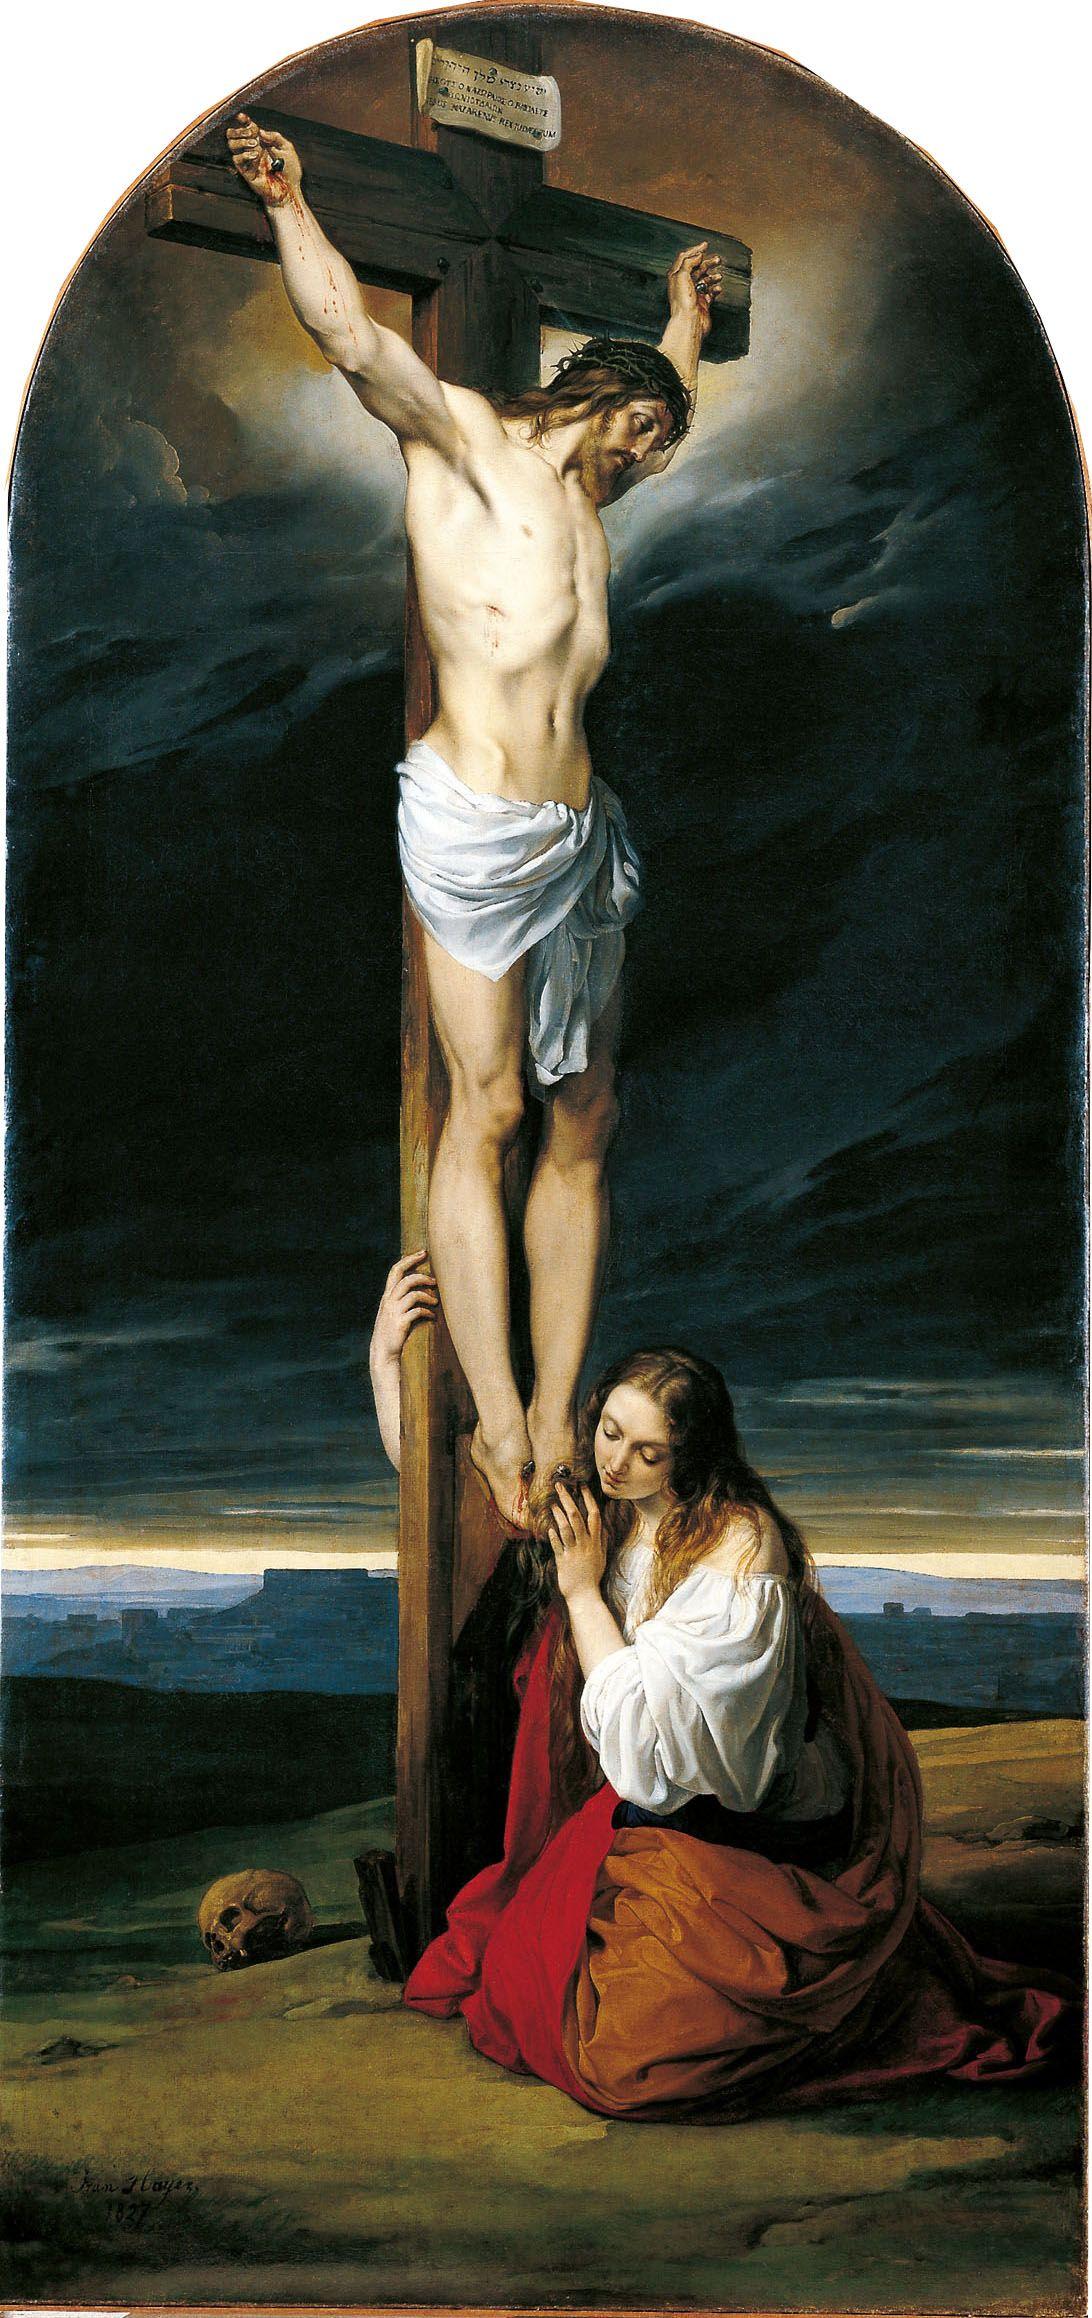 Francesco Hayez Crocifisso Con La Maddalena 1825 1827 Milano Museo Diocesano Mary And Jesus Jesus Christ Images Crucifixion Of Jesus